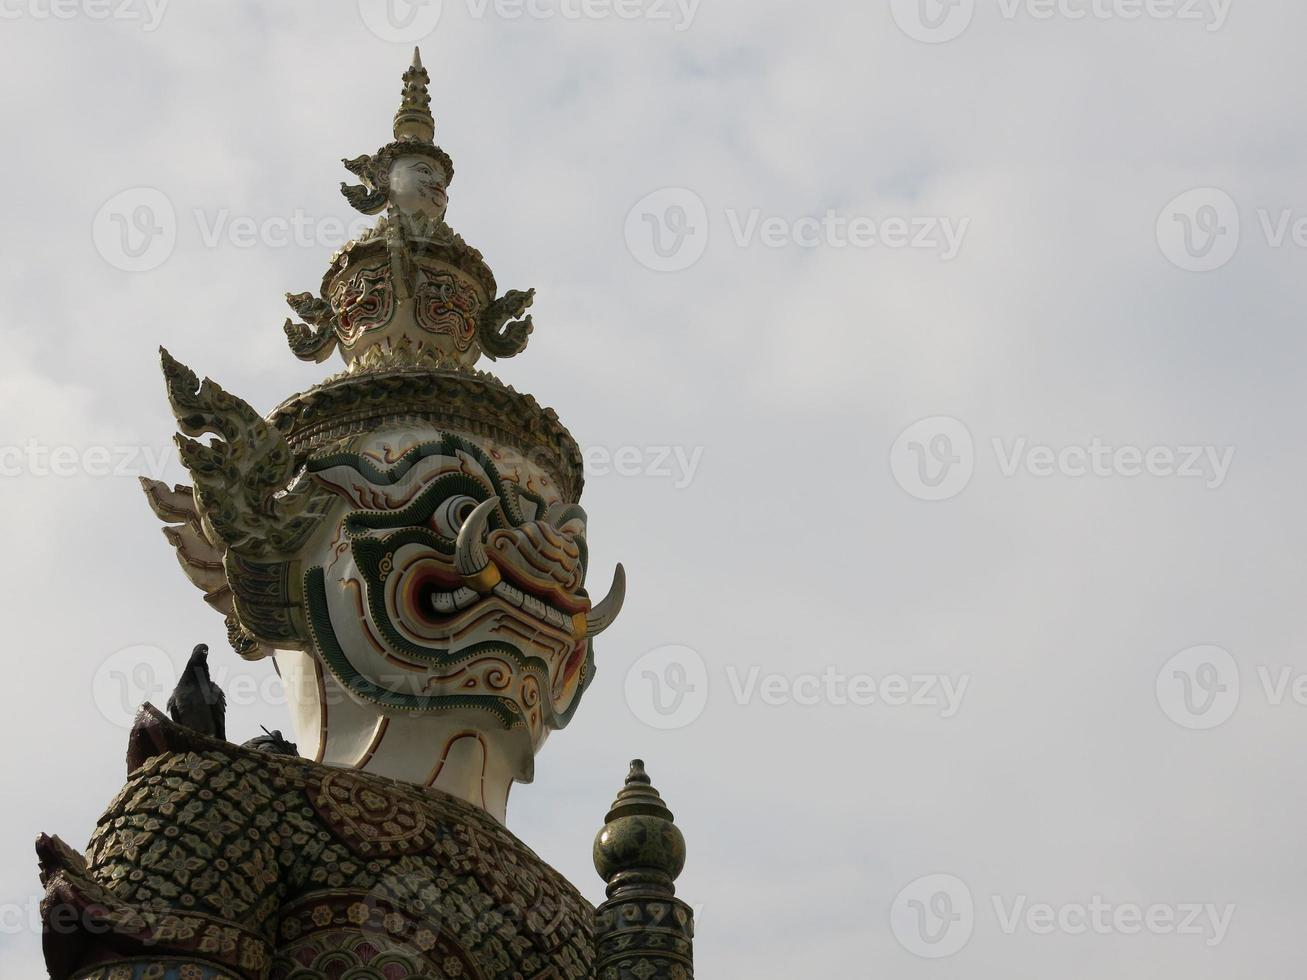 Buddha giant sculpture in Wat Phra Kaew Thailand photo